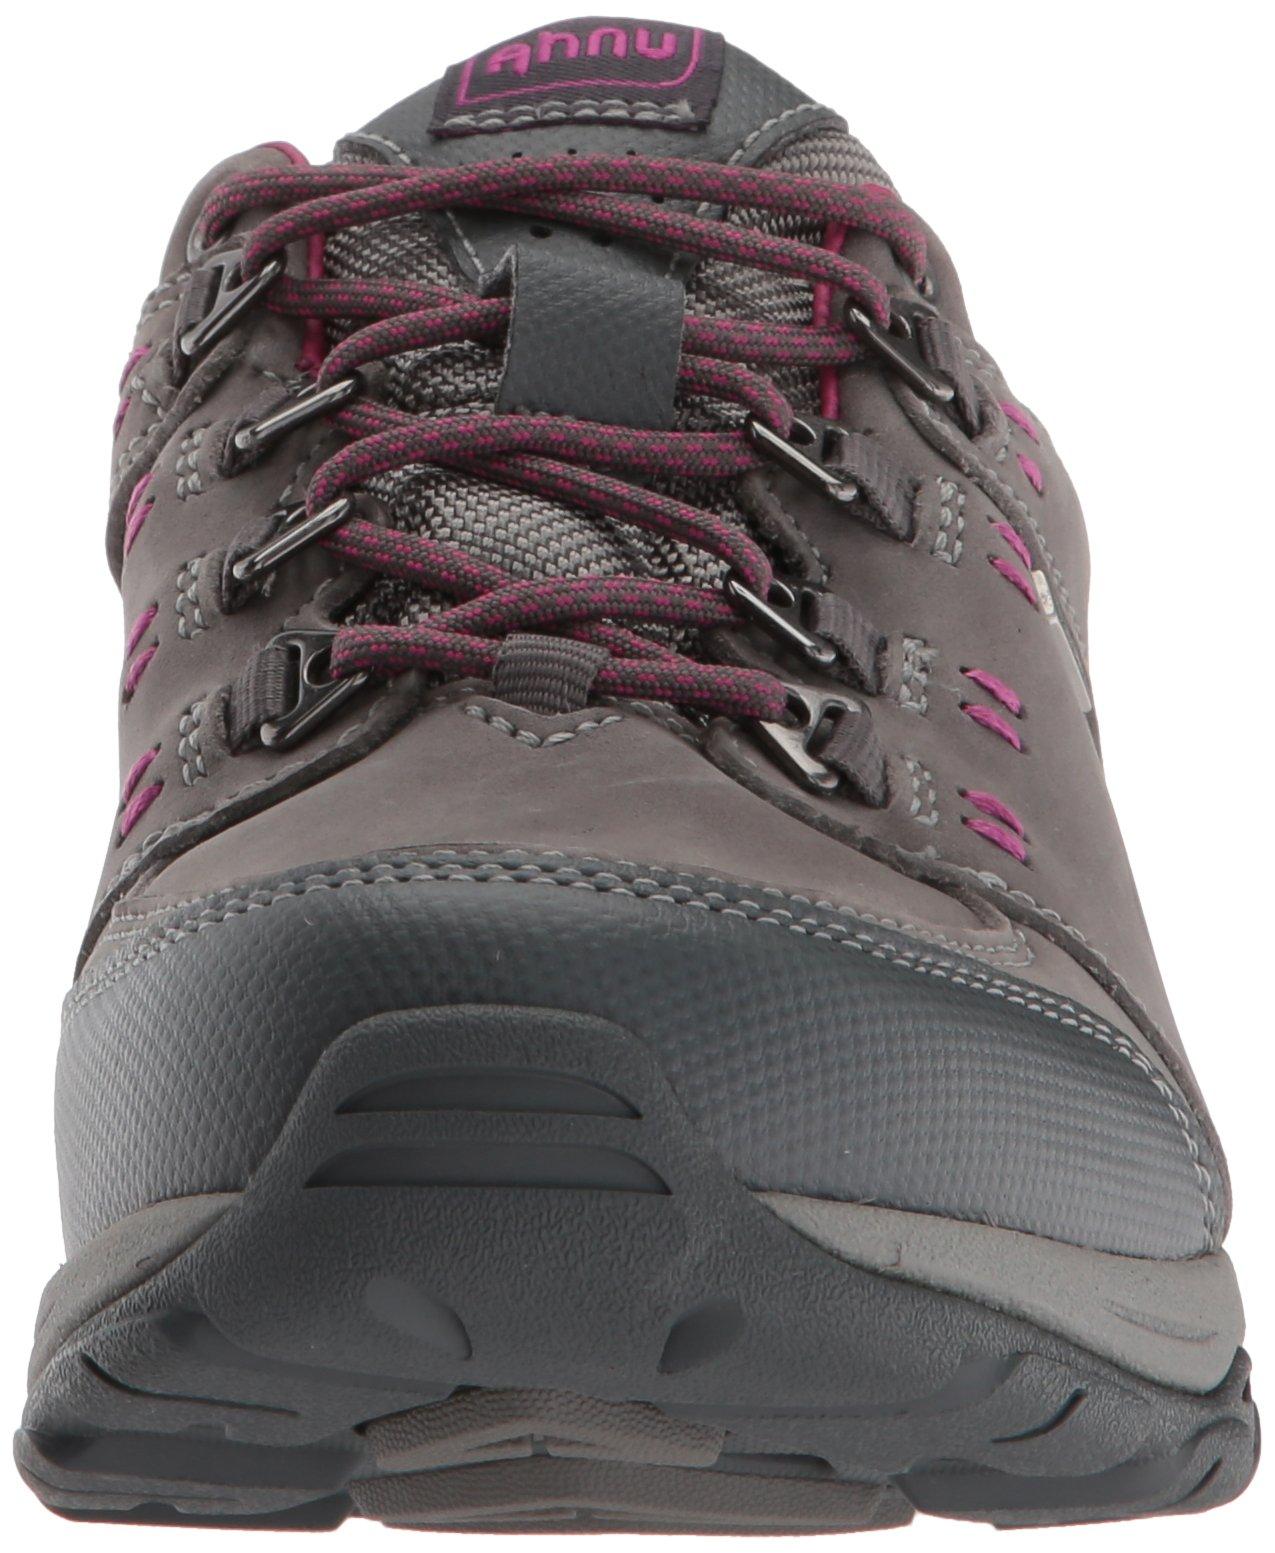 Ahnu Women's W Montara III Event Hiking Boot, Charcoal, 6 Medium US by Ahnu (Image #4)